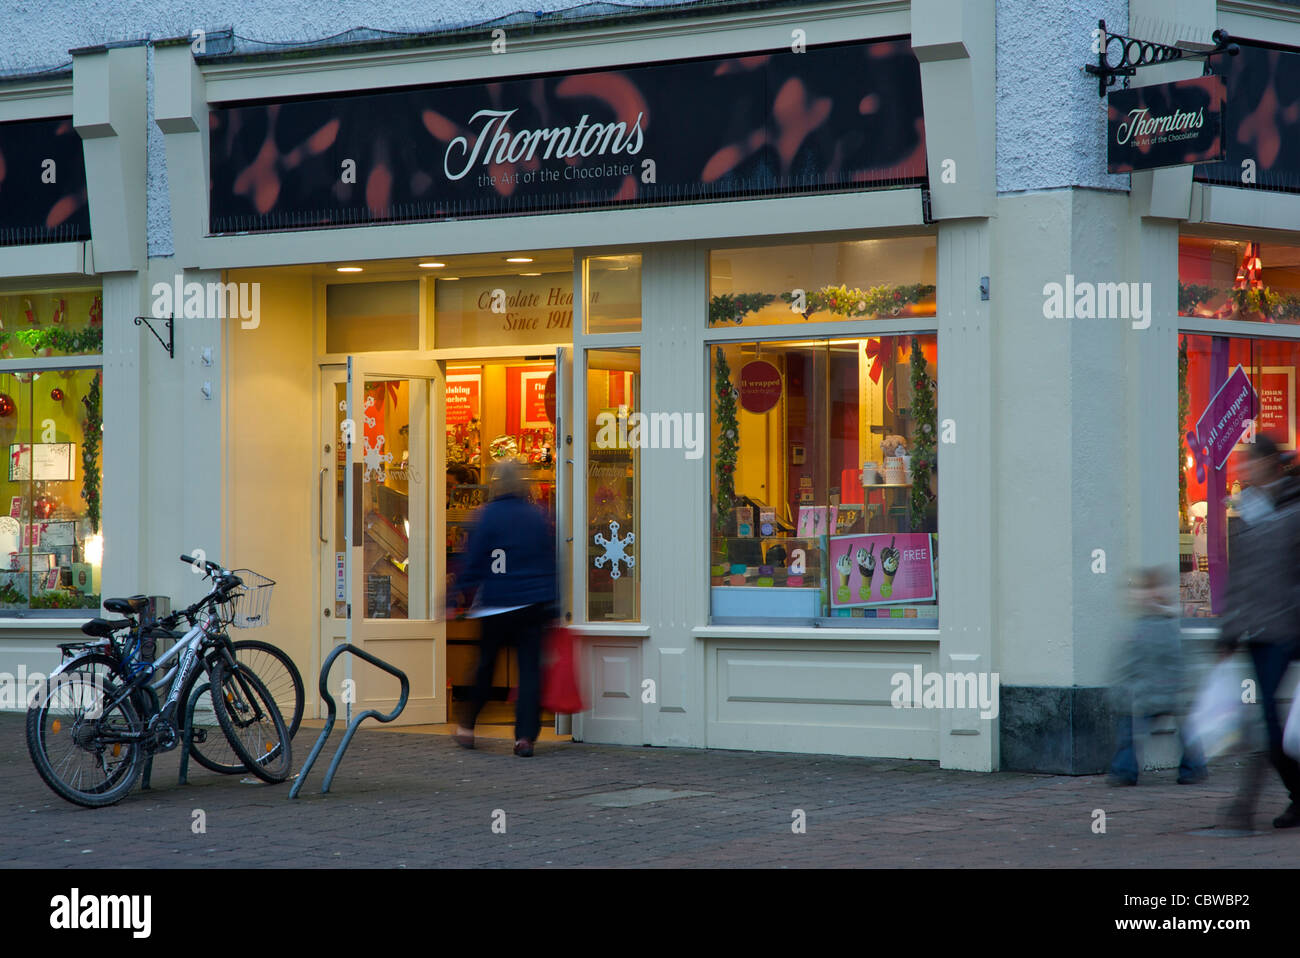 Thorntons Chocolate Shop, Stricklandgate, Kendal, Cumbria, England UK - Stock Image